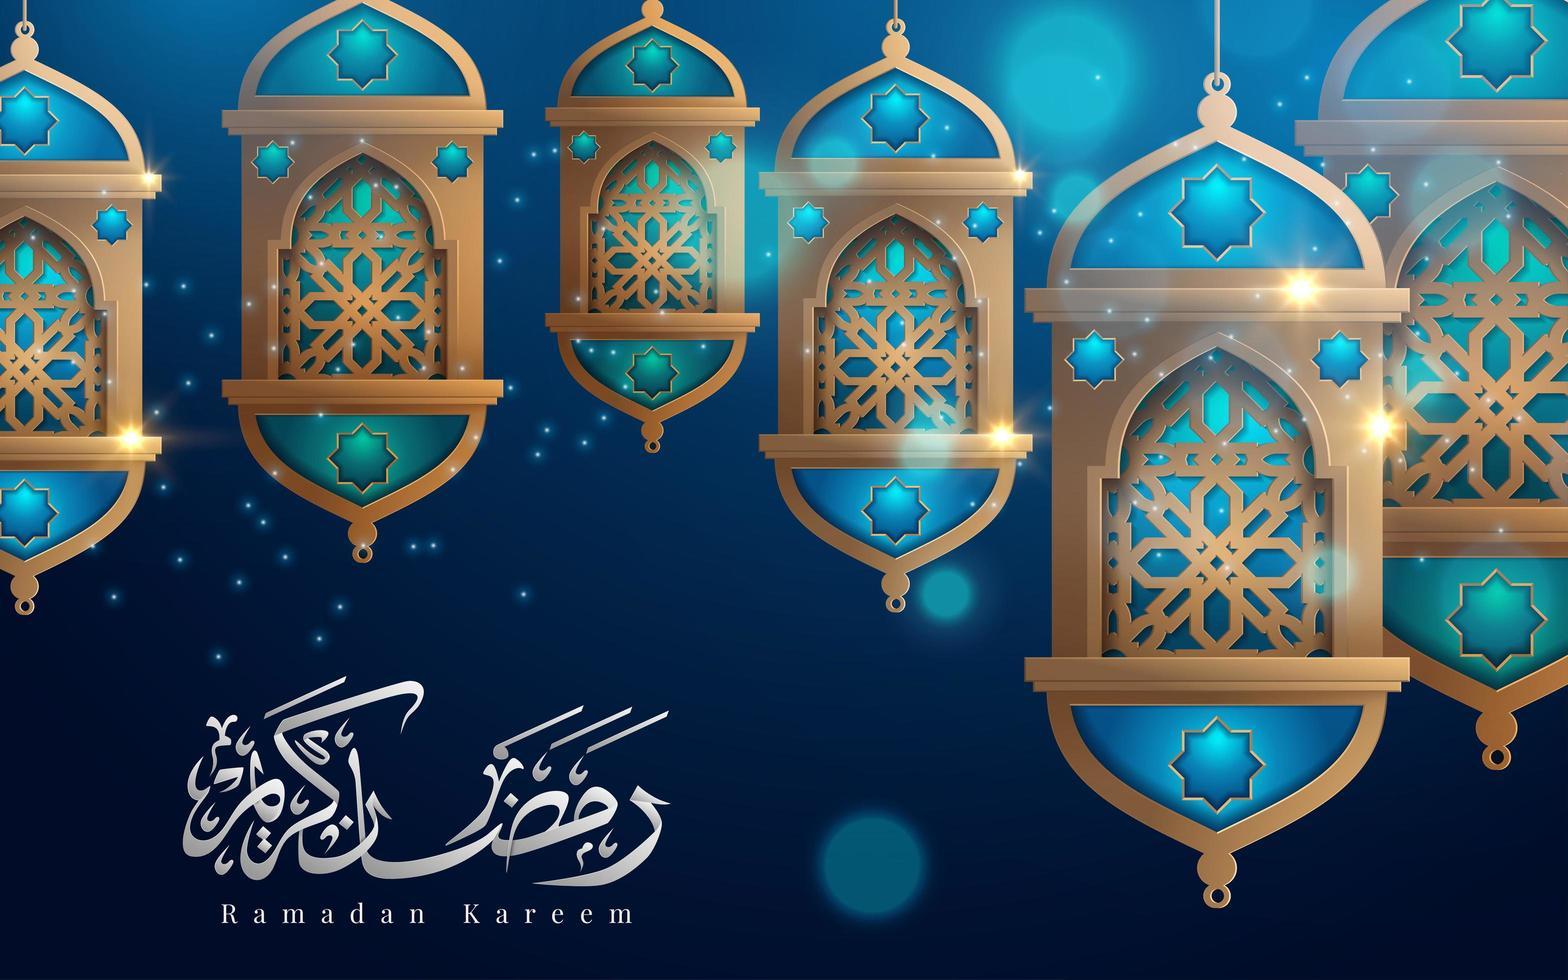 Ramadan Kareem hängende Laternen auf blauem Gruß vektor